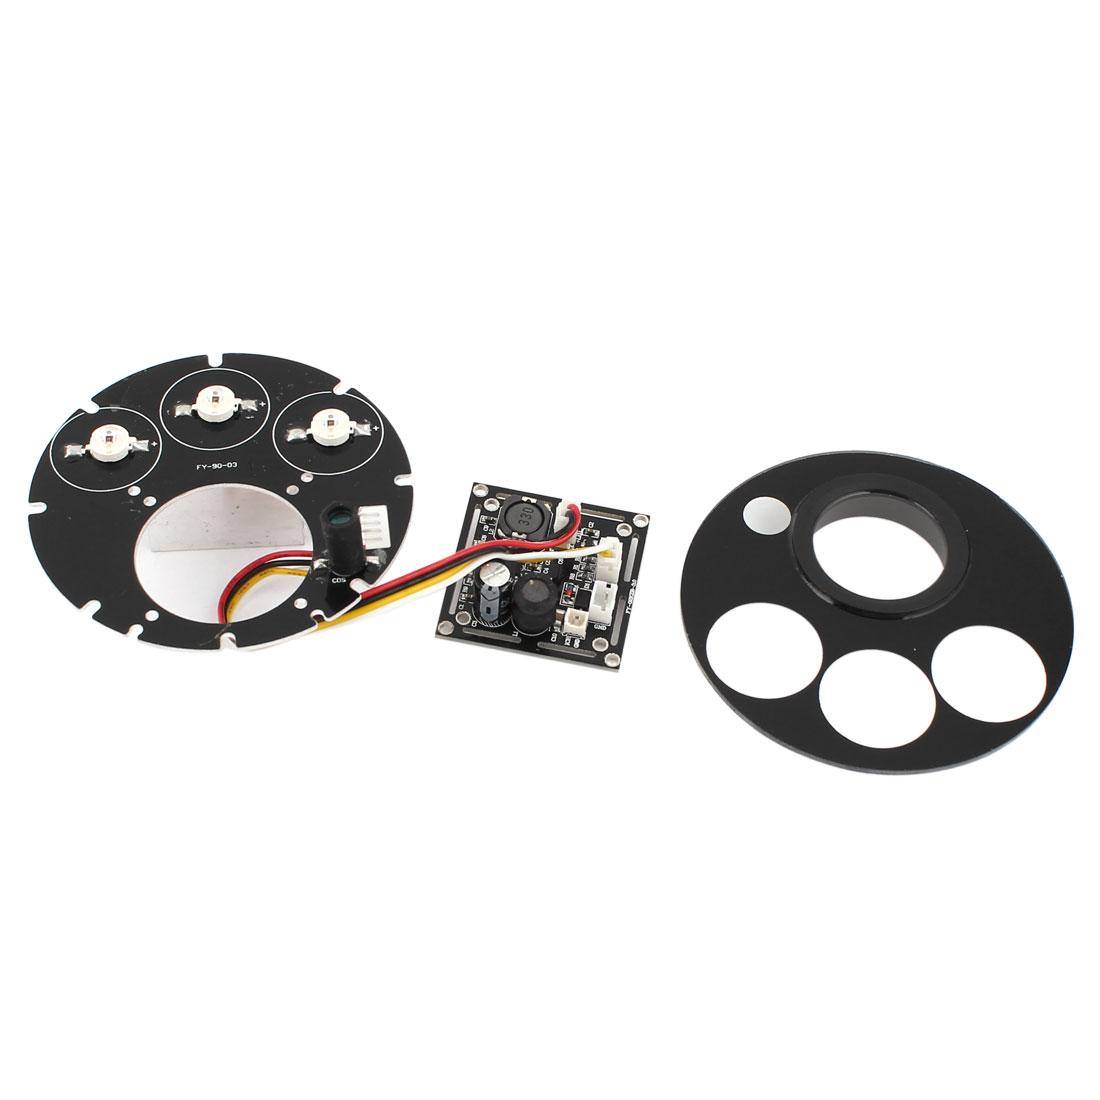 CCTV Security Camera 42mil 3 Array Red 3 LED IR Illuminator Bulb Board 76mmx76mm